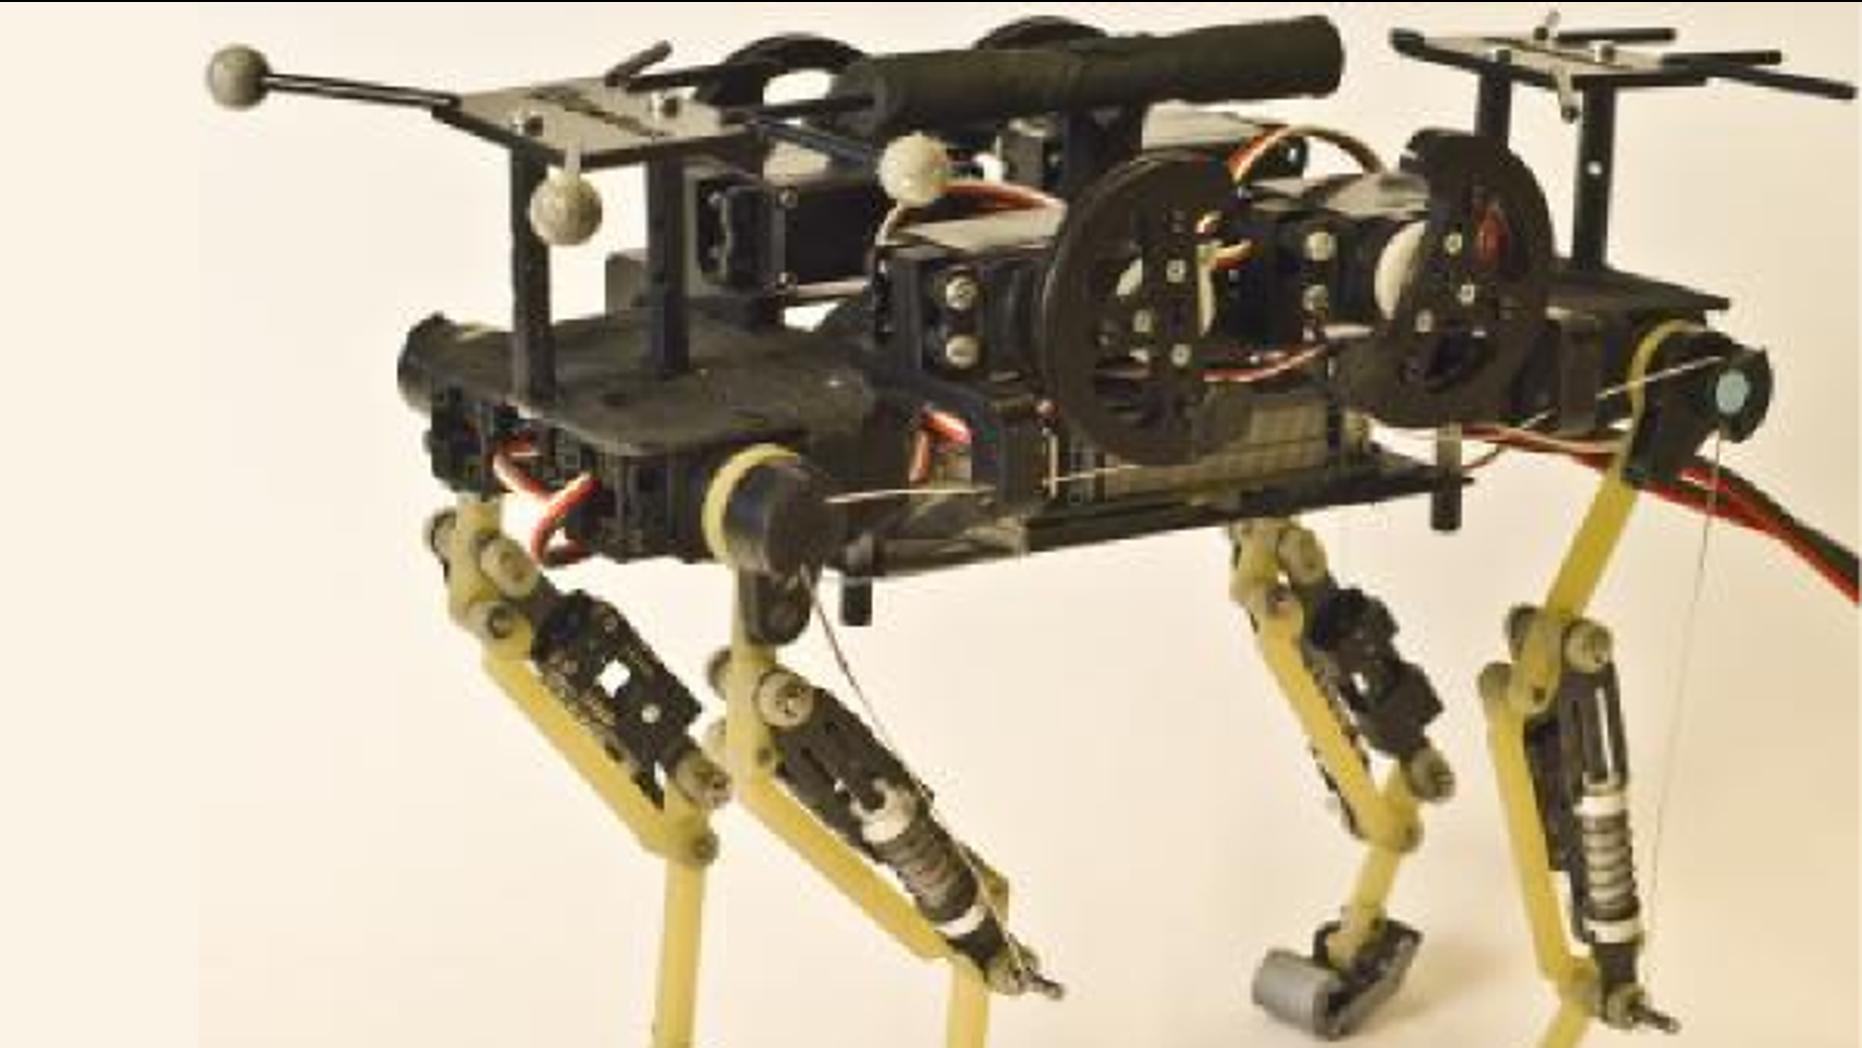 This is Cheetah-cub, a robust quadruped robot.